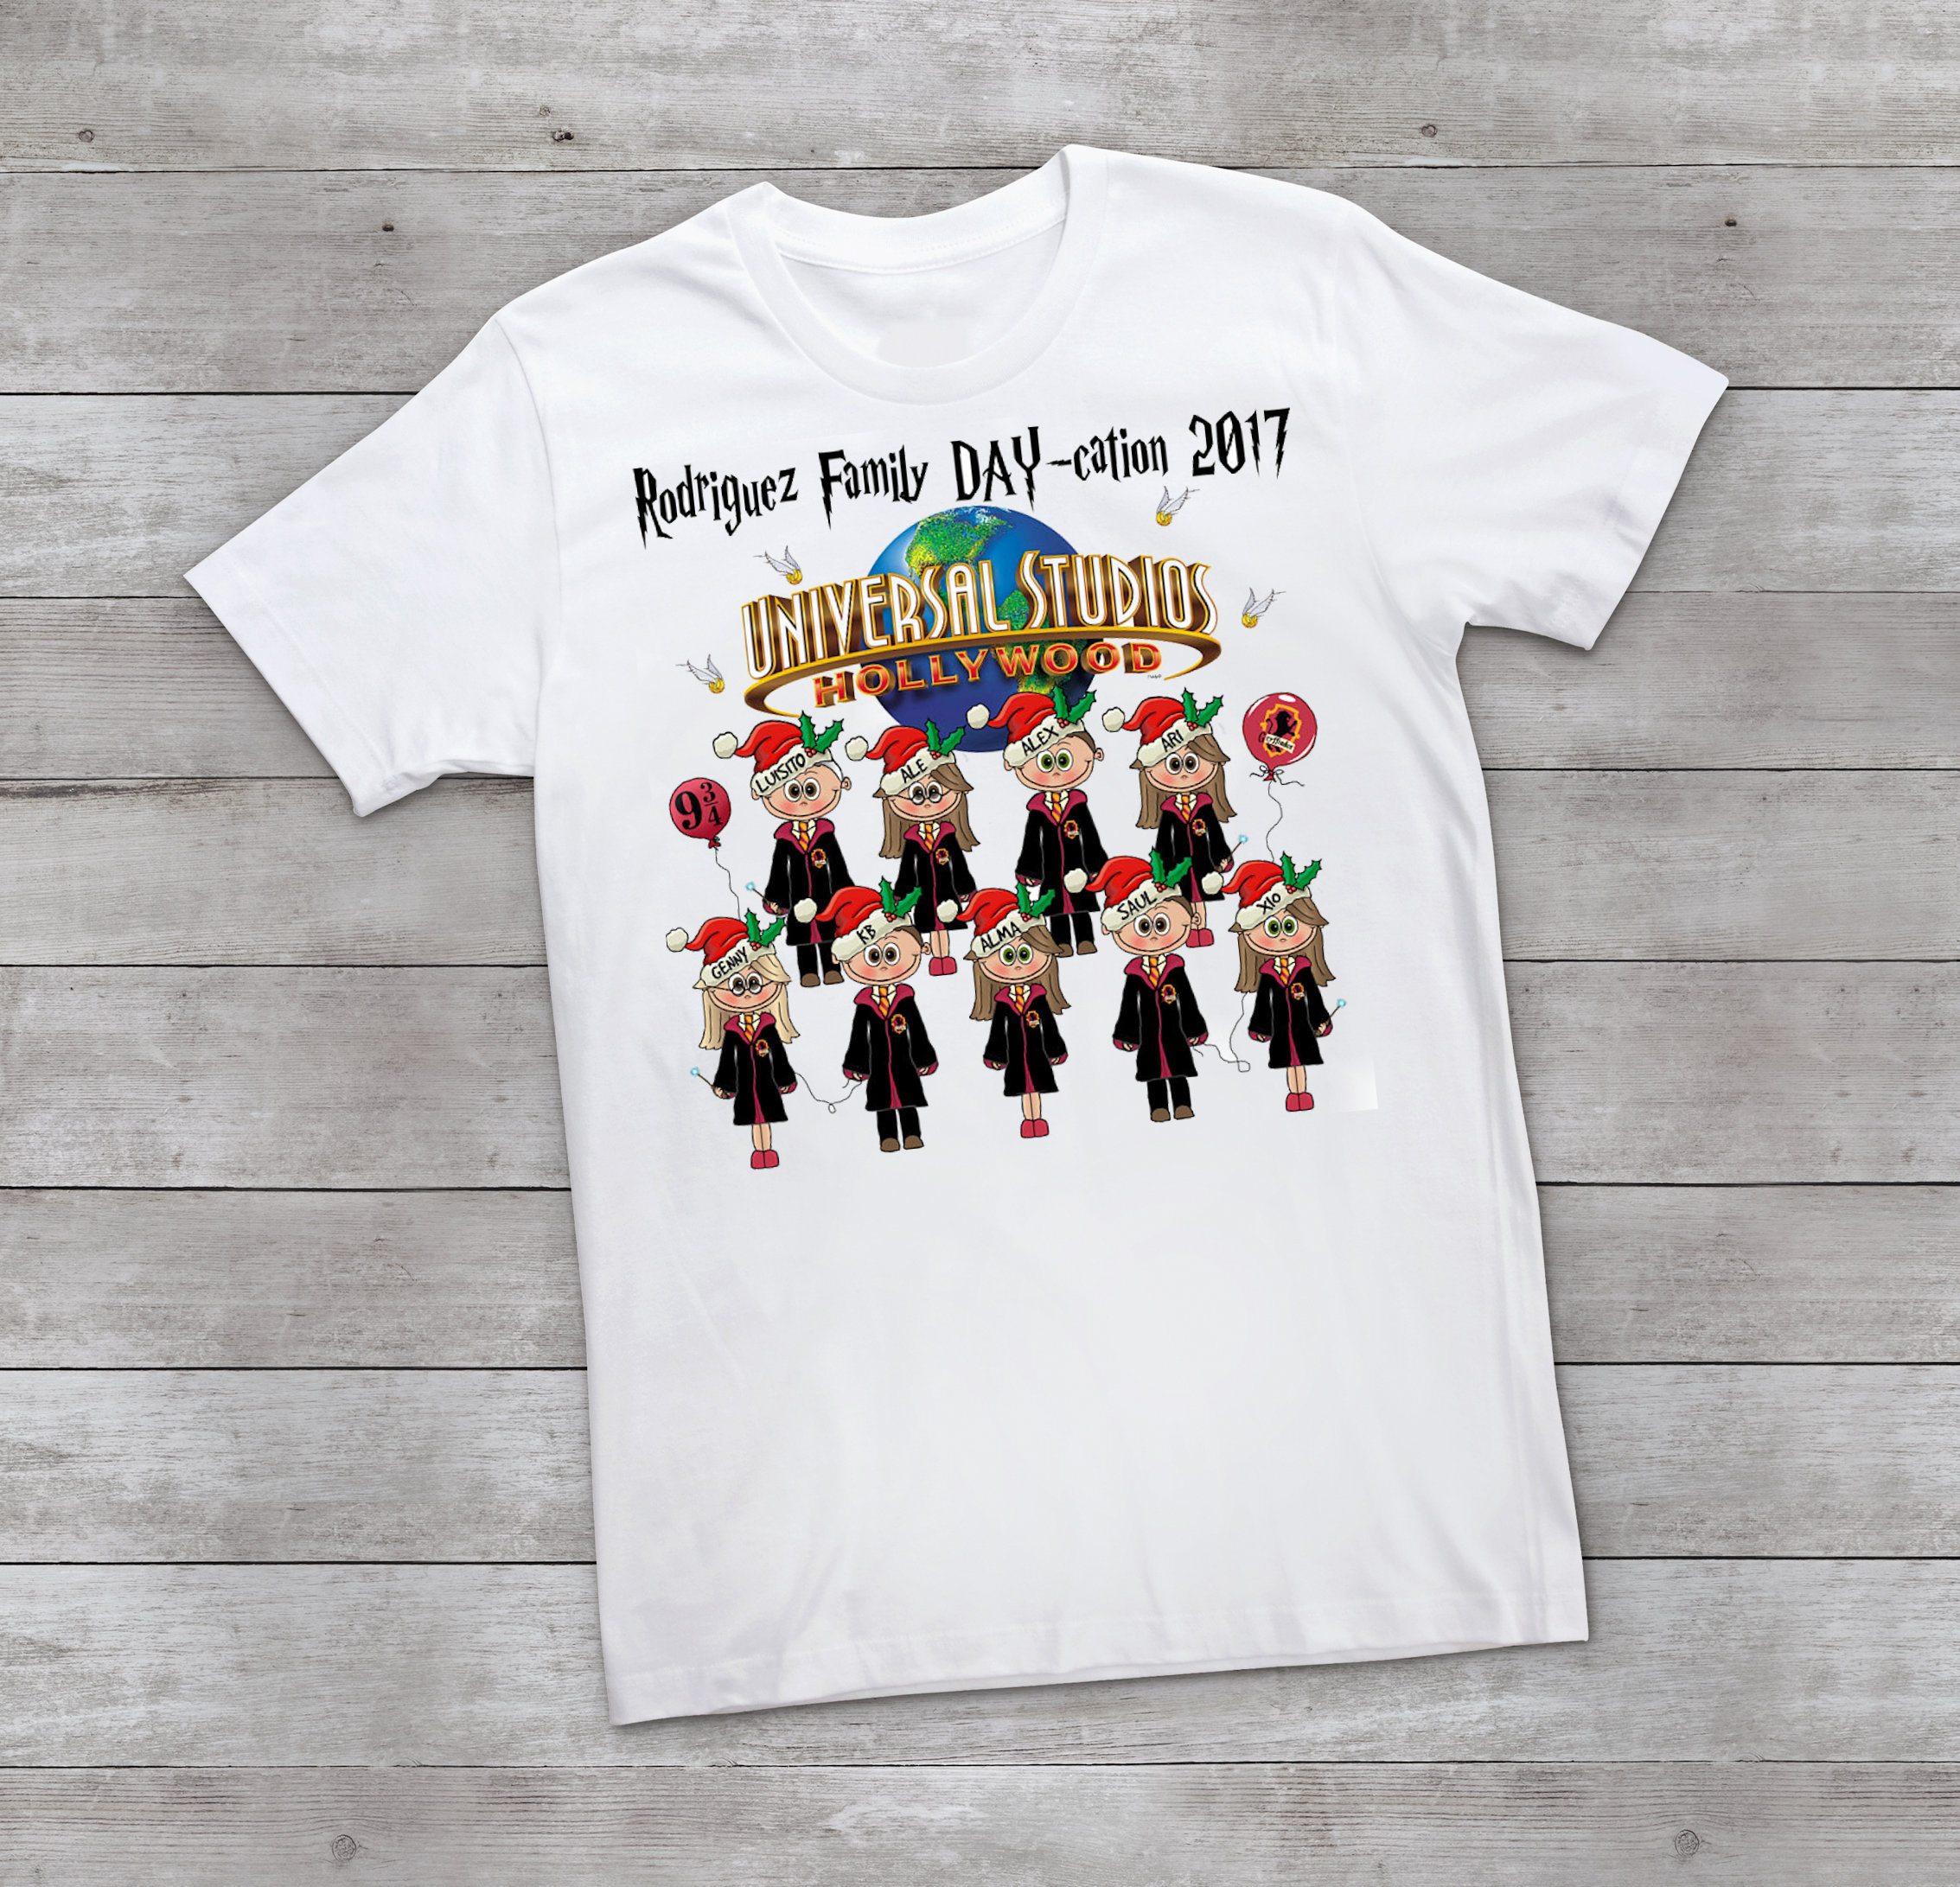 c6546832b Family Vacation T Shirts Ideas Universal Studios